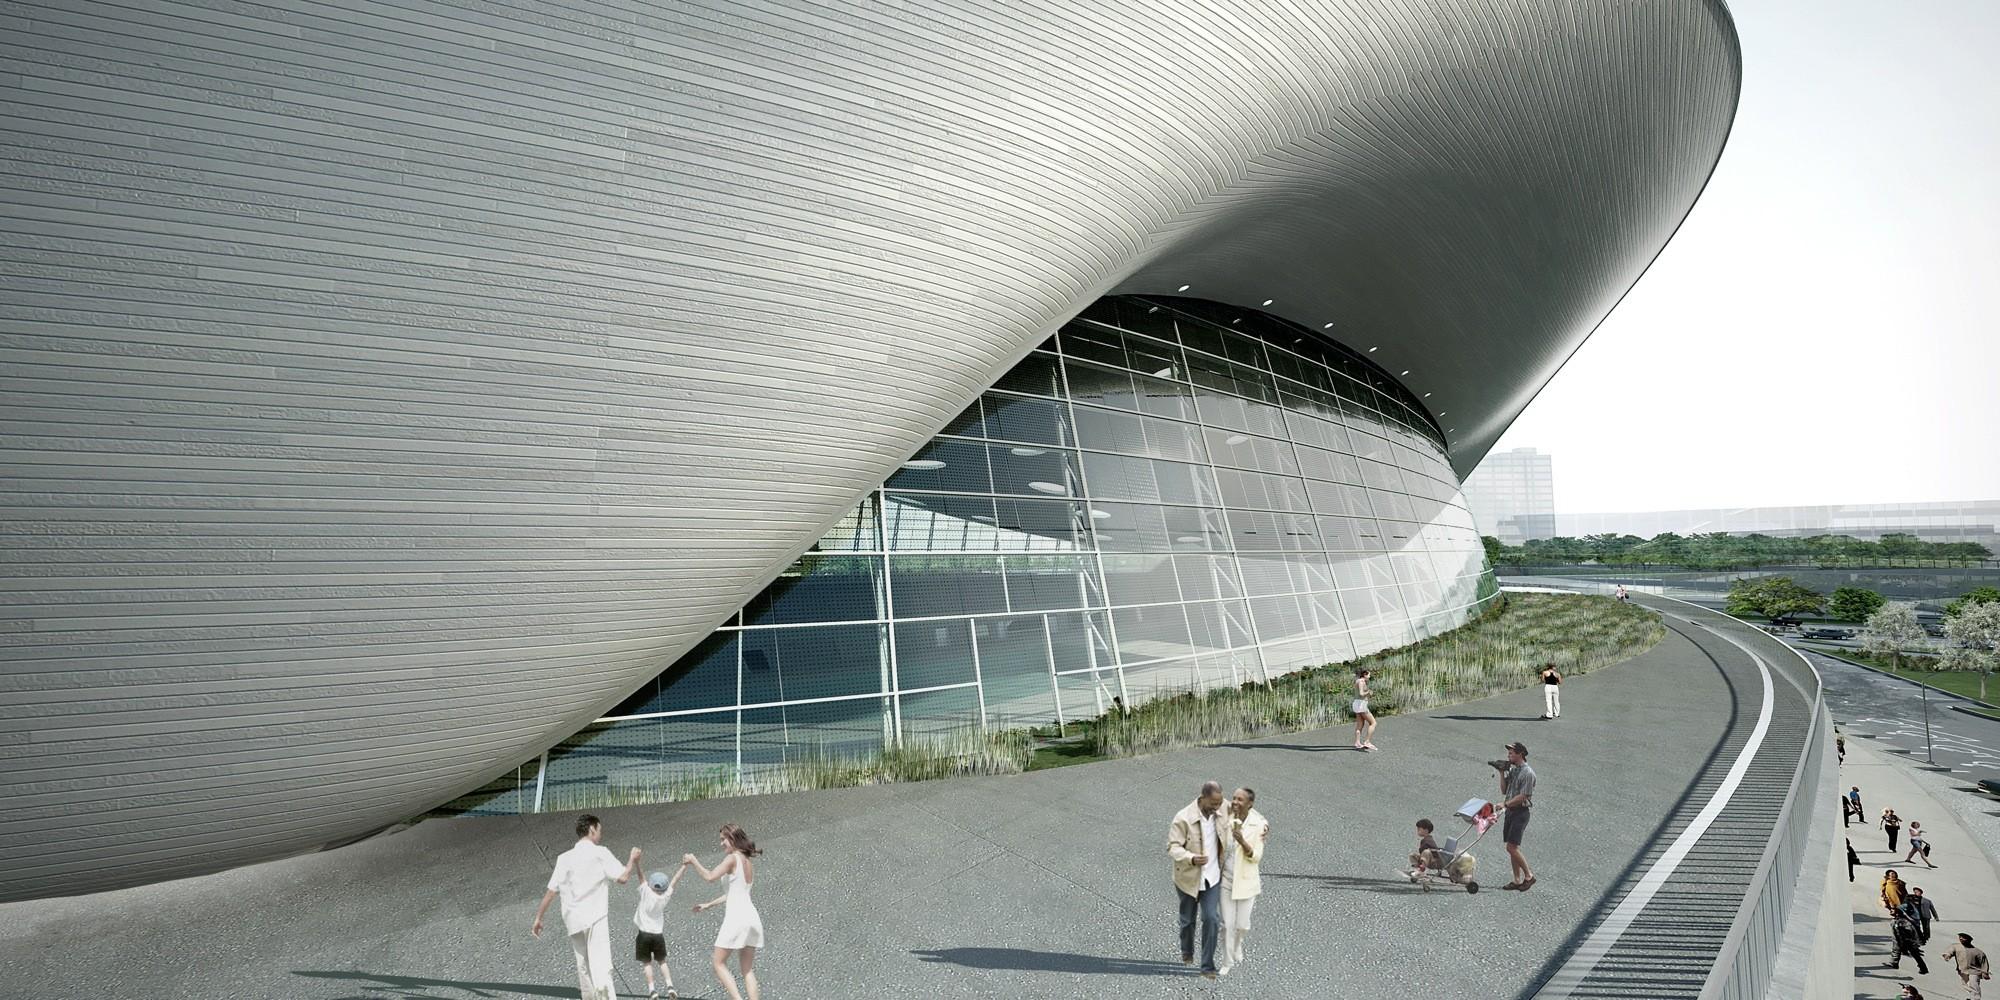 Gallery of London Aquatics Centre for 2012 Summer Olympics ...